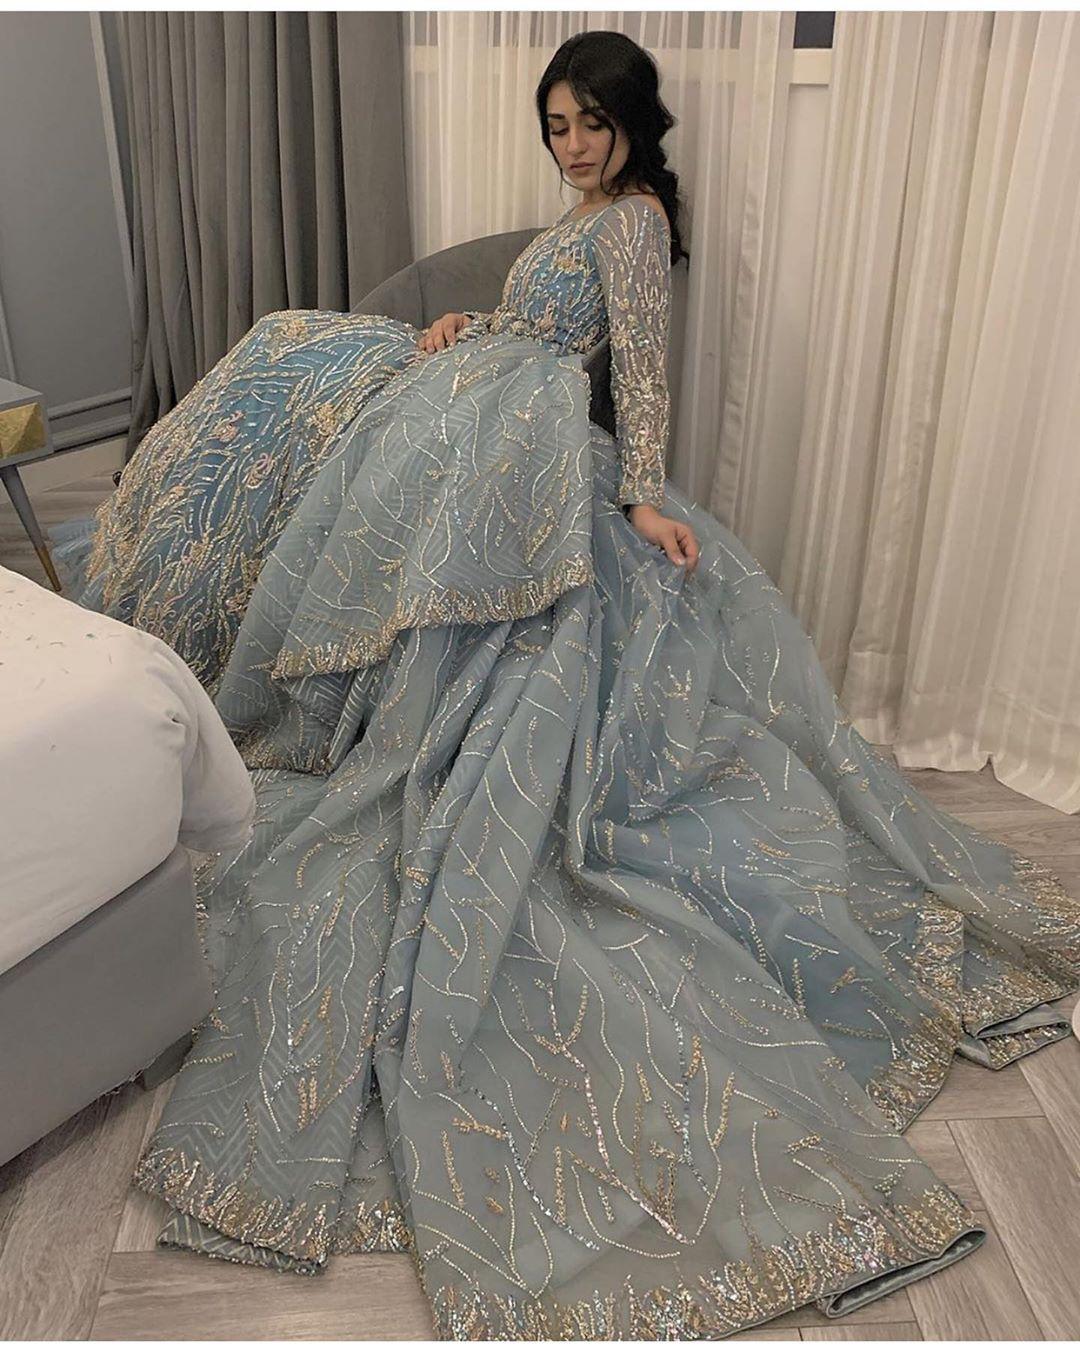 Pakistani Celebrities At The Pfdc Loreal Paris Bridal Week 2019 Reviewit Pk